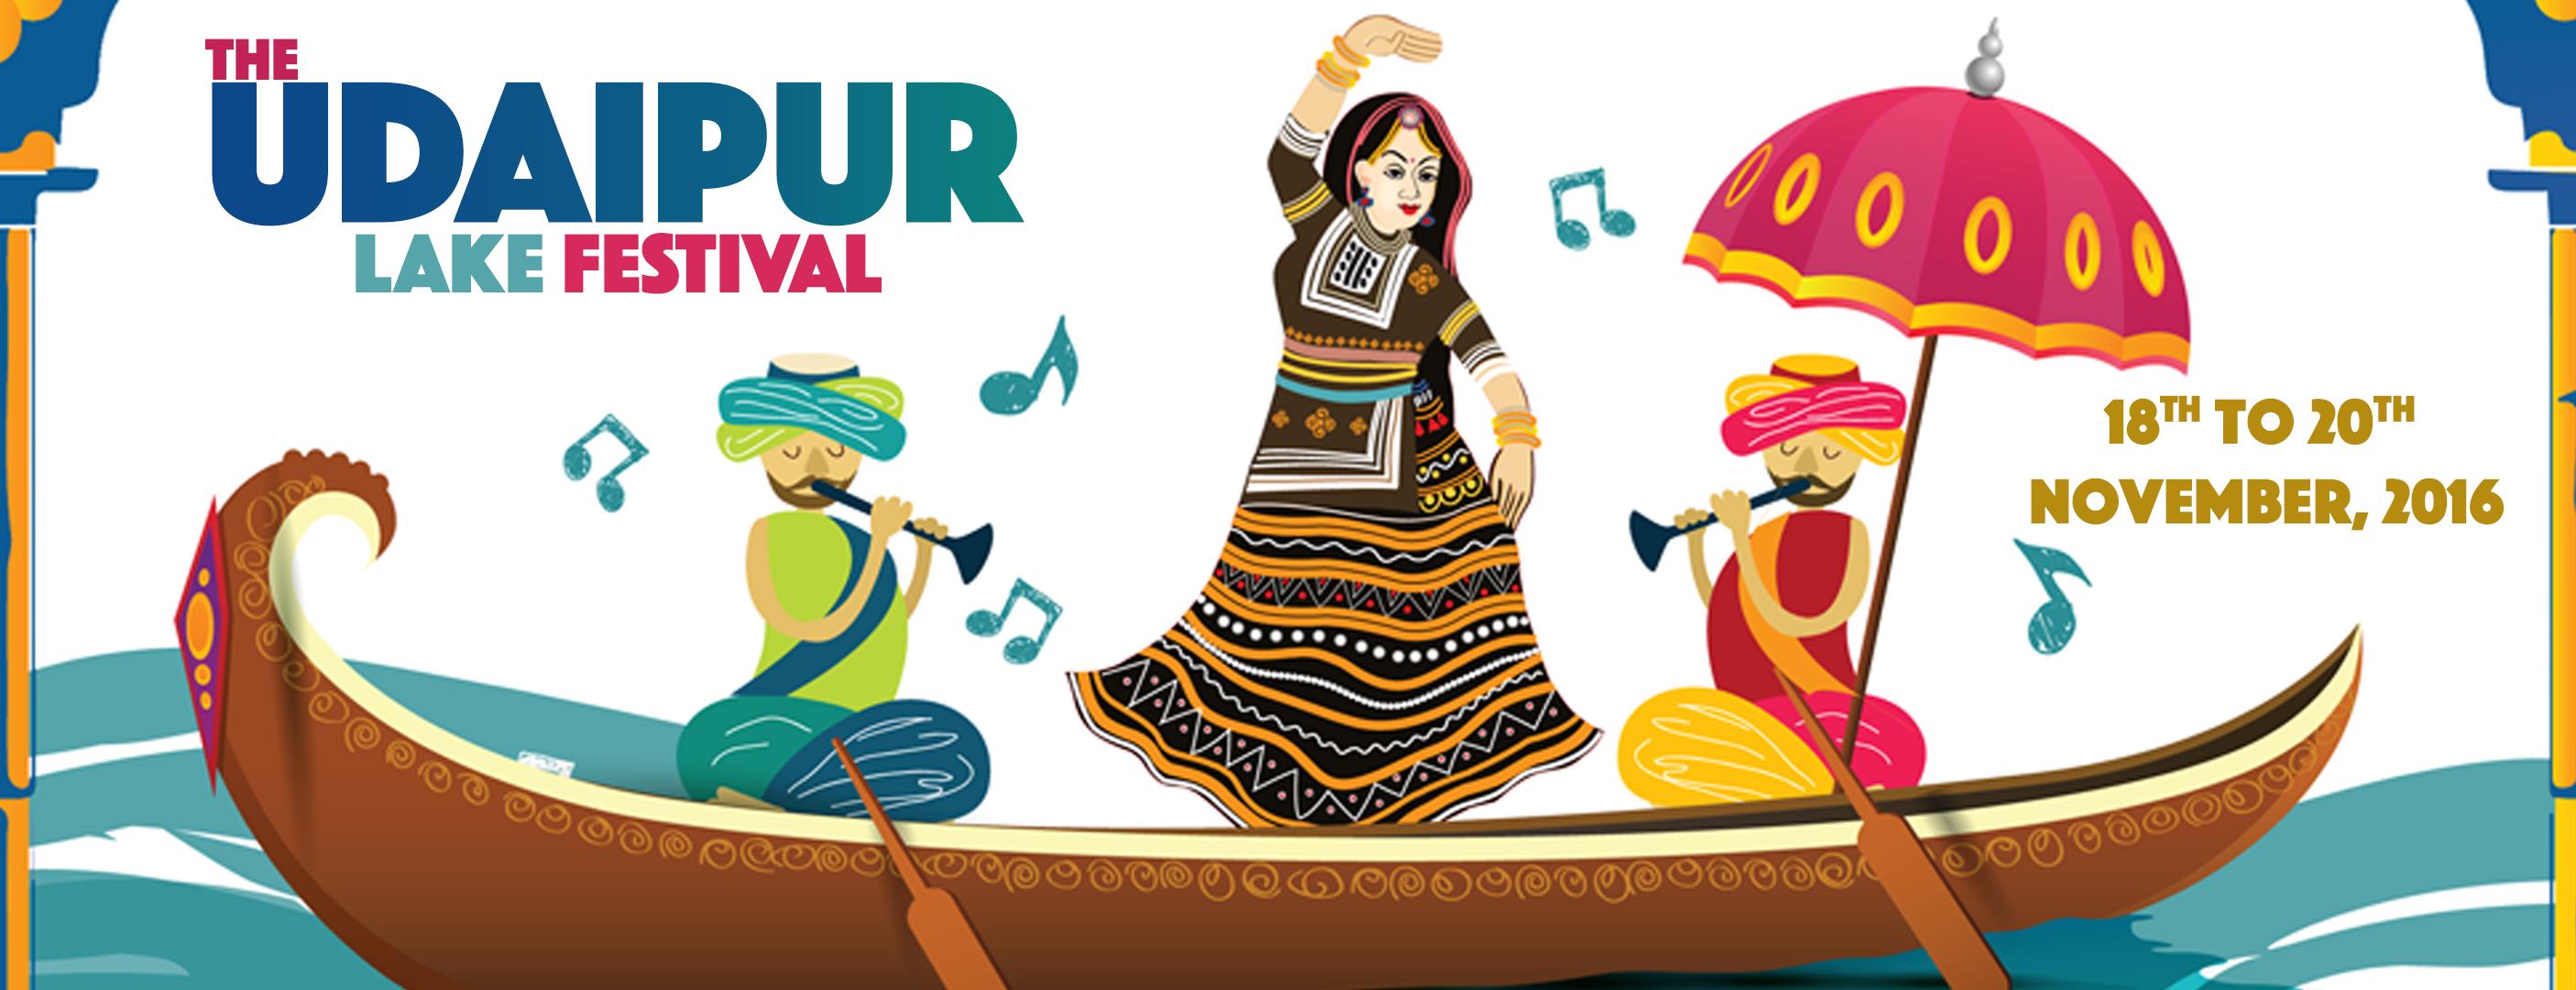 The Udaipur Lake Festival 2016.